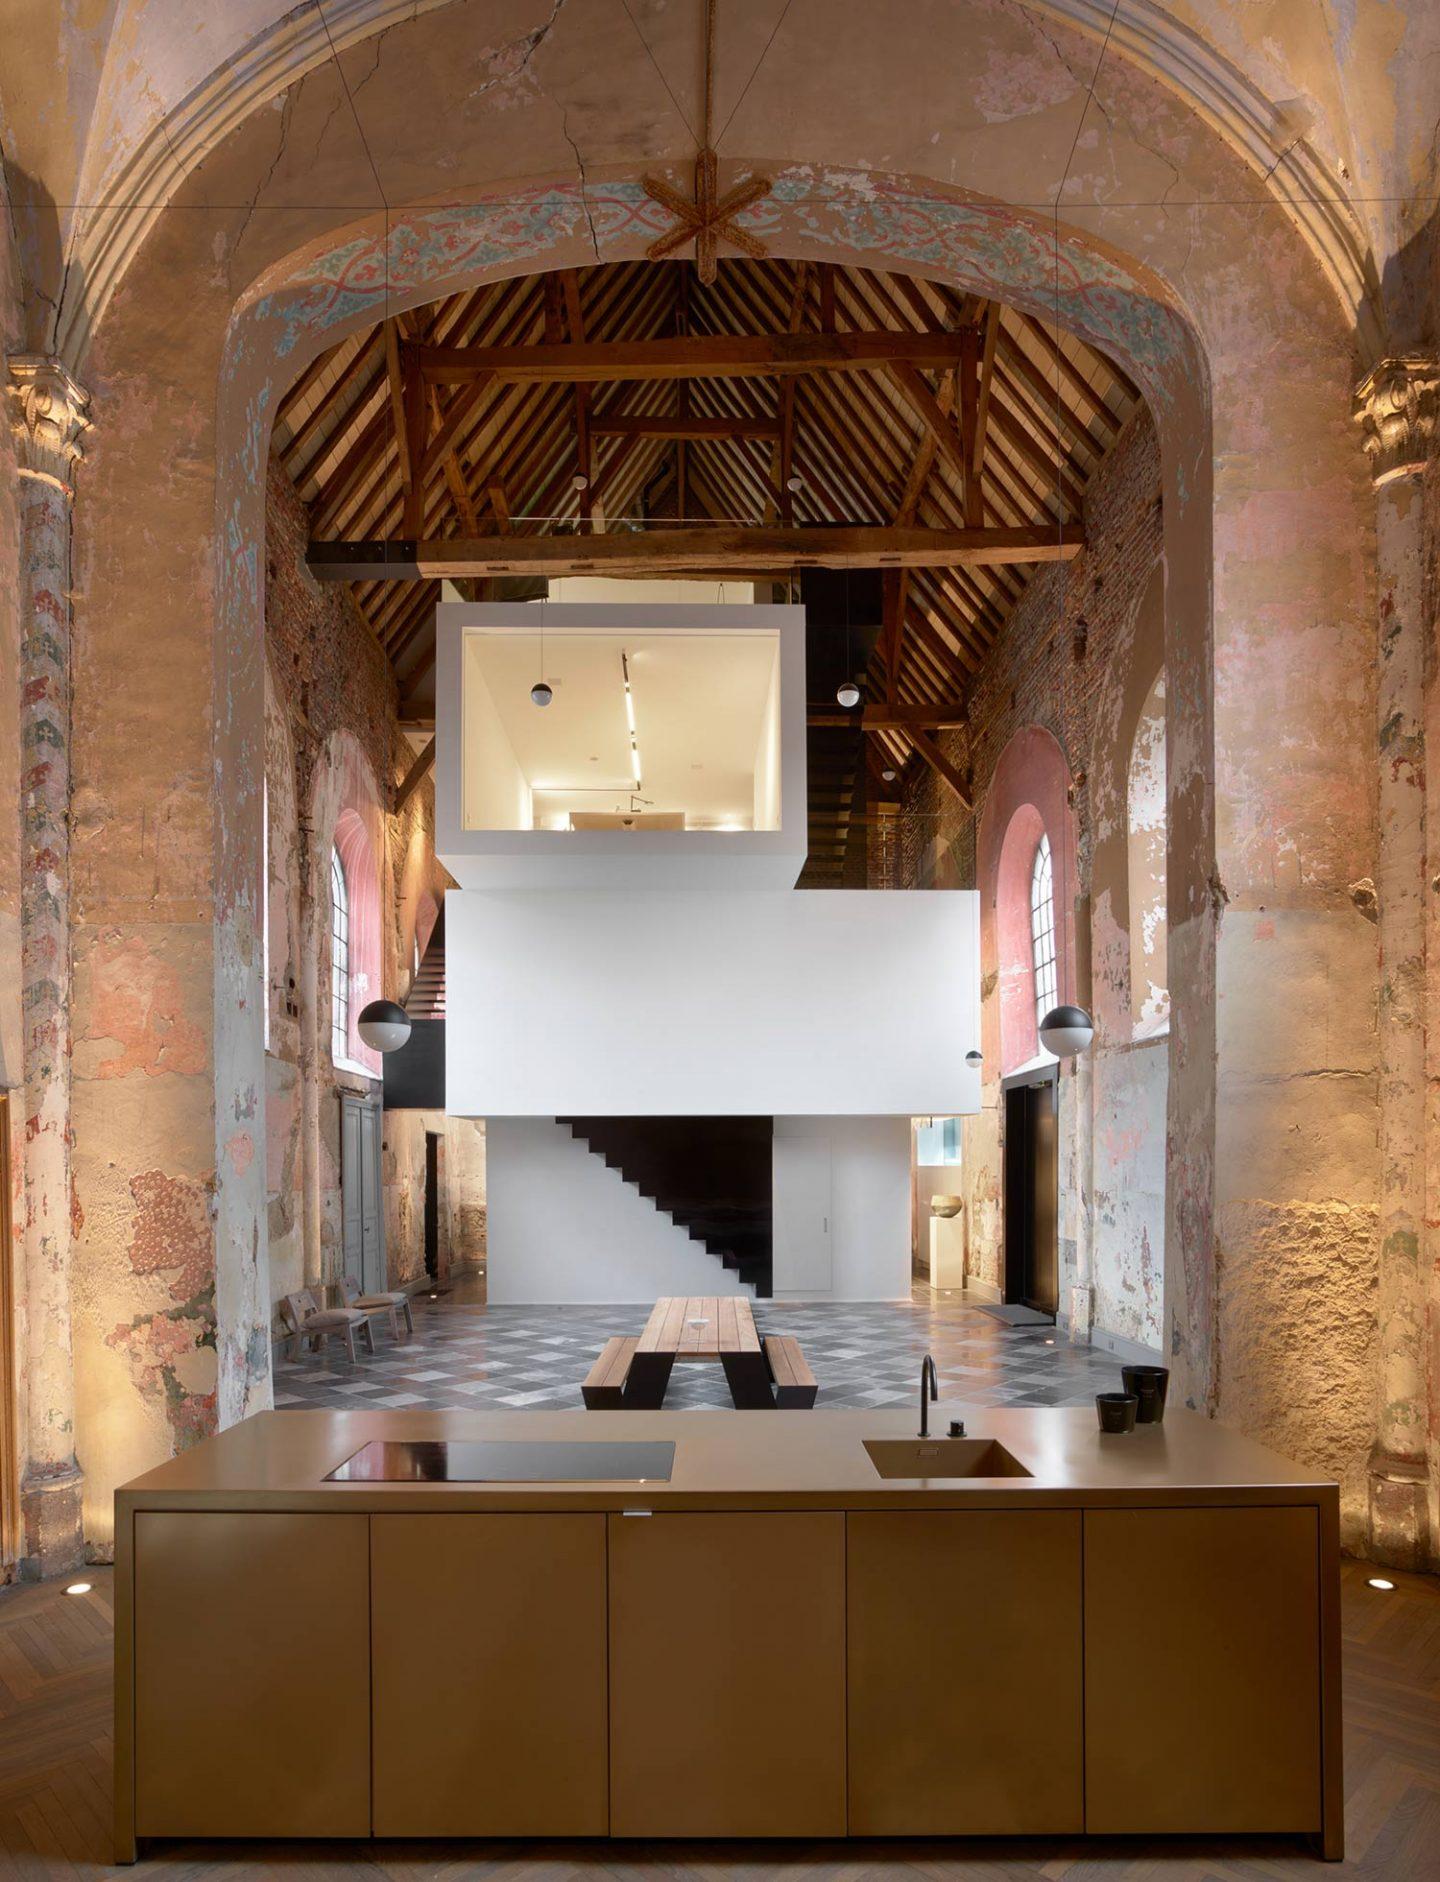 iGNANT-Architecture-The-Waterdog-Klaarchitectuur-1